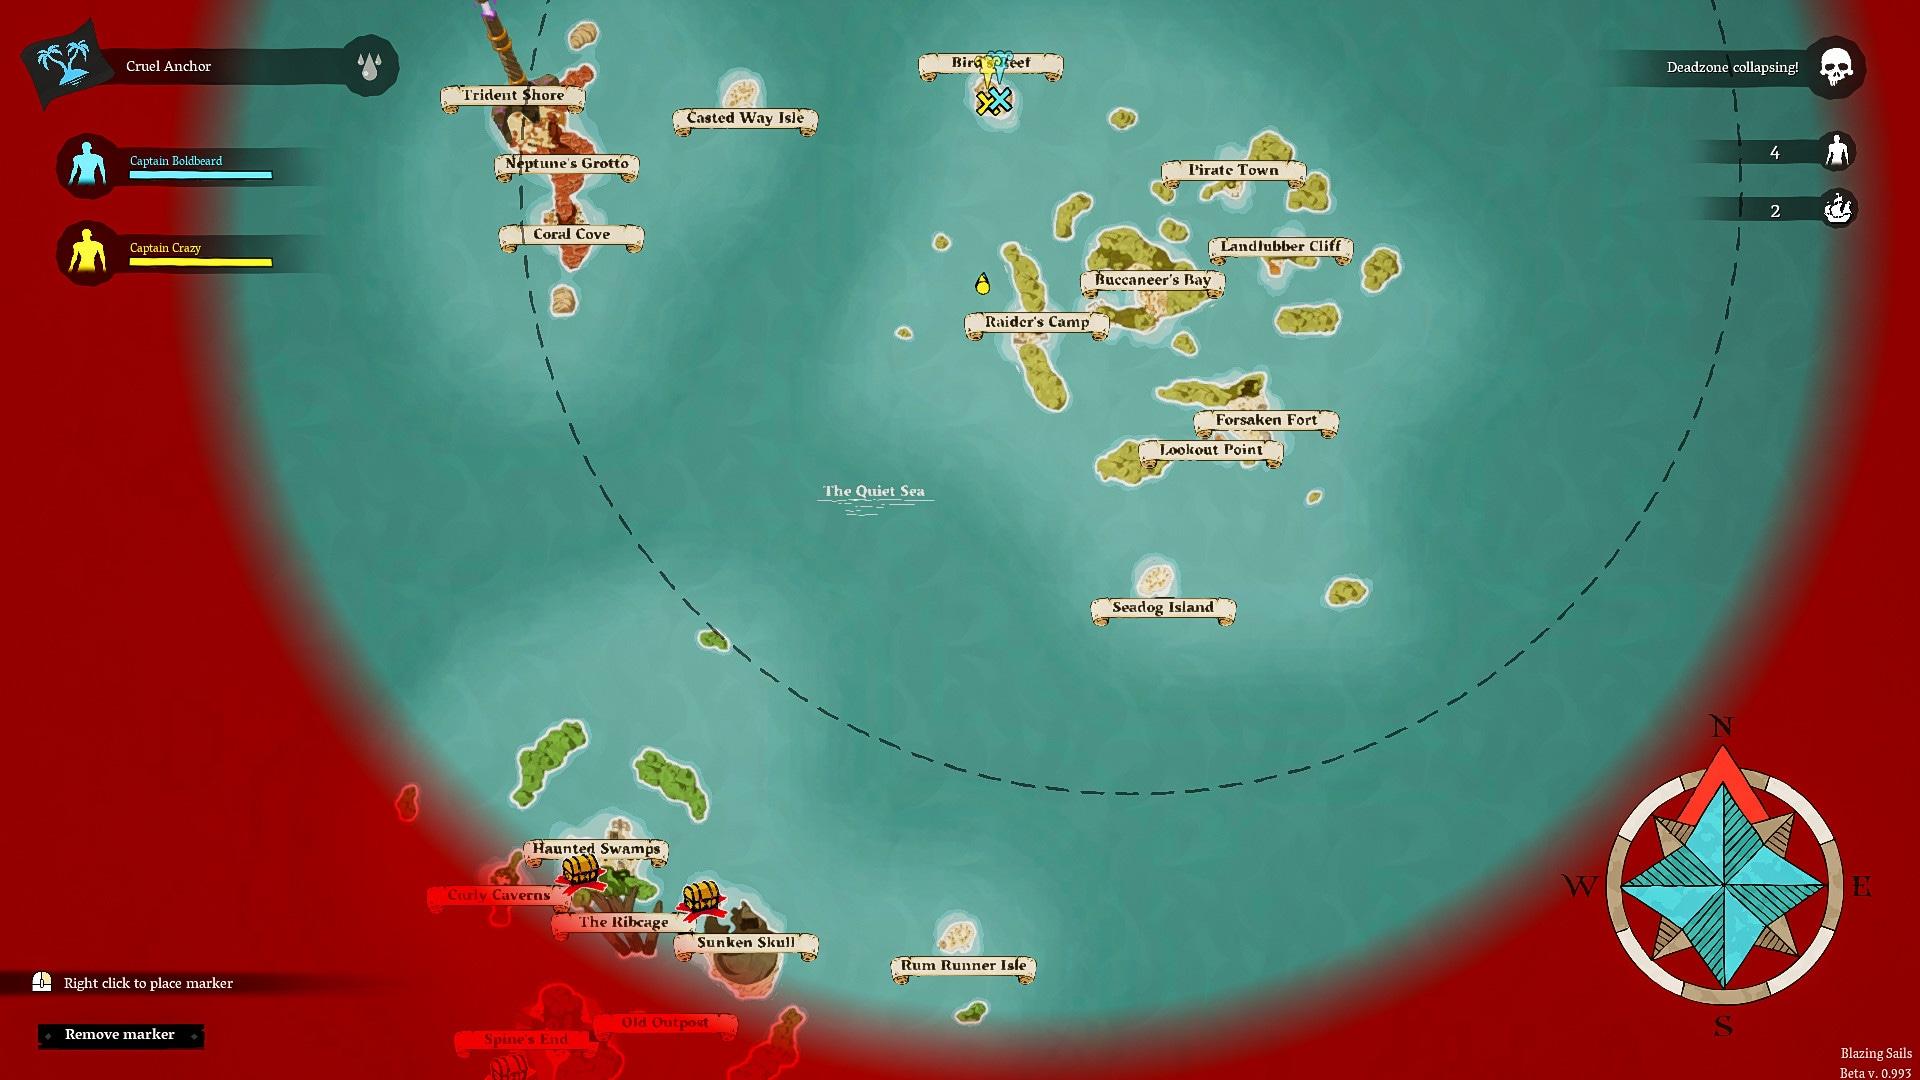 Blazing Sails: Pirate Battle Royale (PC) - Steam Key - RU/CIS - 4